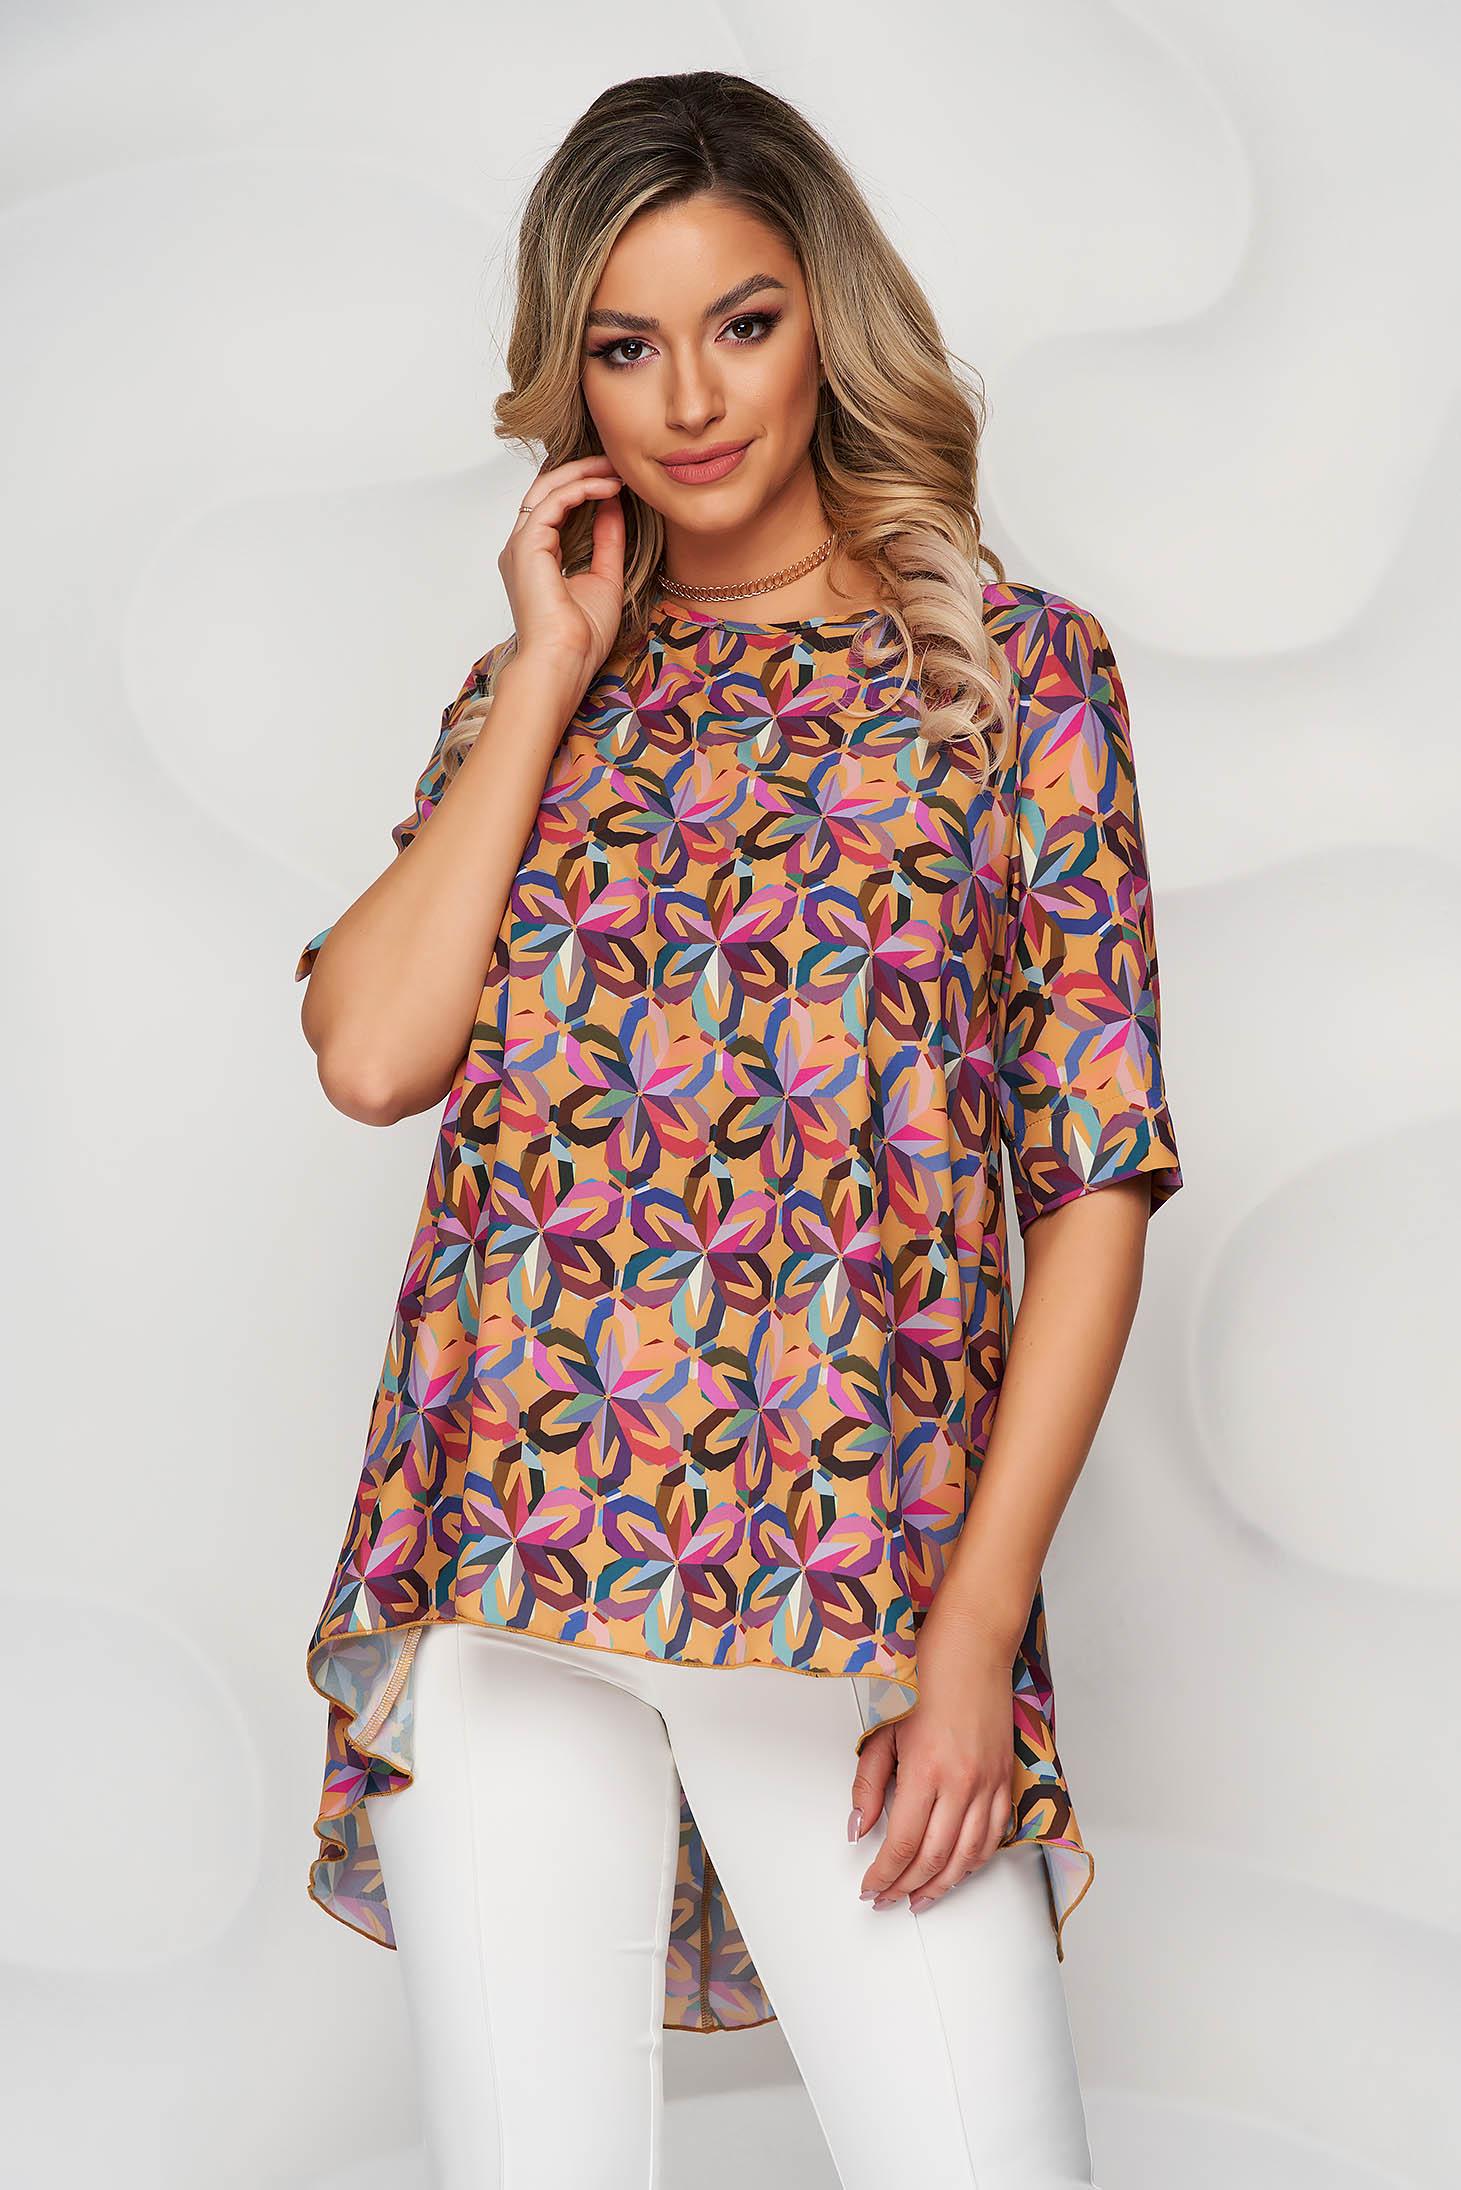 Bluza dama StarShinerS mustarie cu imprimeu floral cu croi larg asimetrica din material neelastic